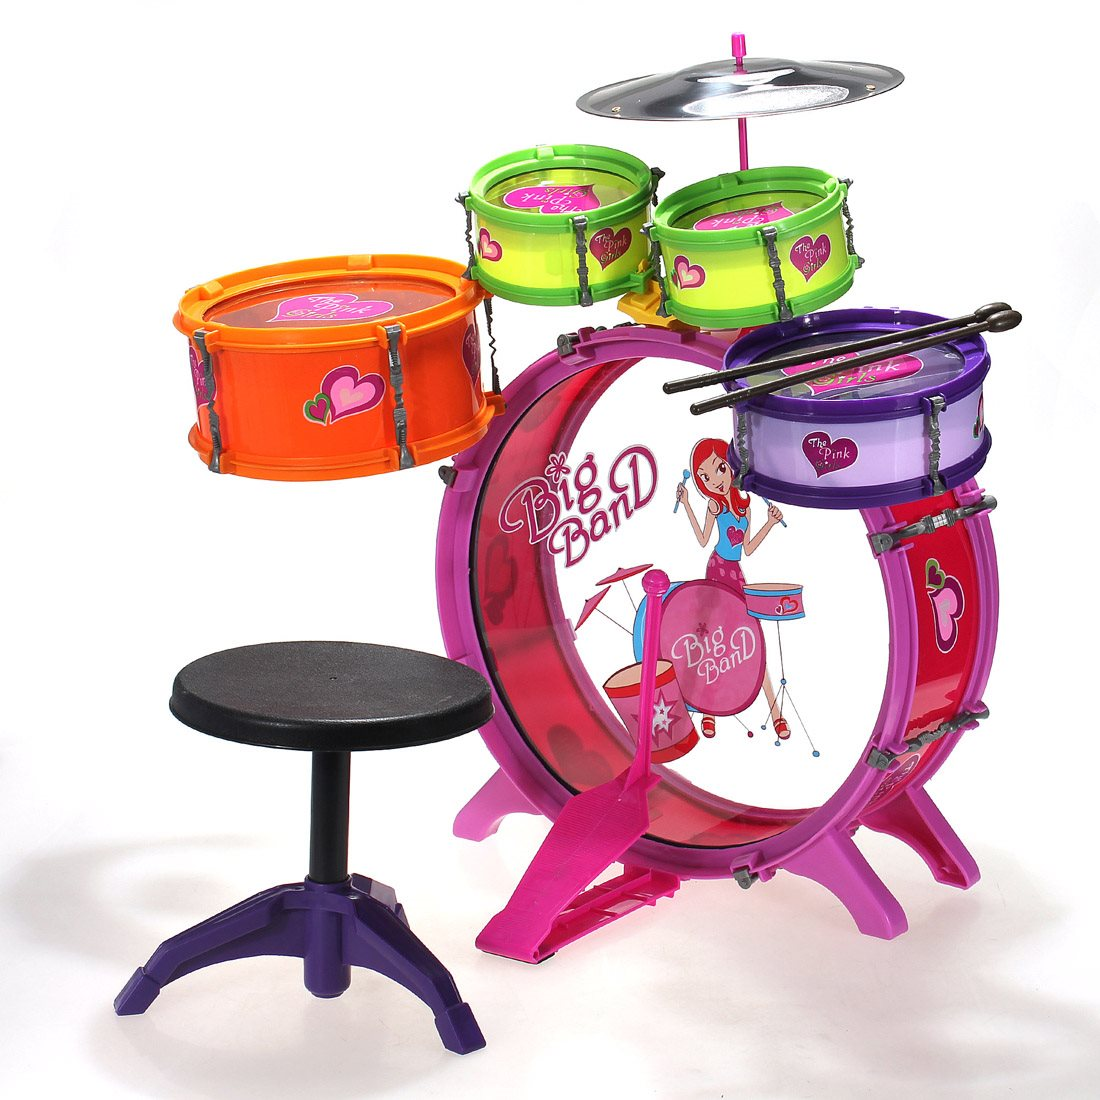 Medium Crop Of Toddler Drum Set